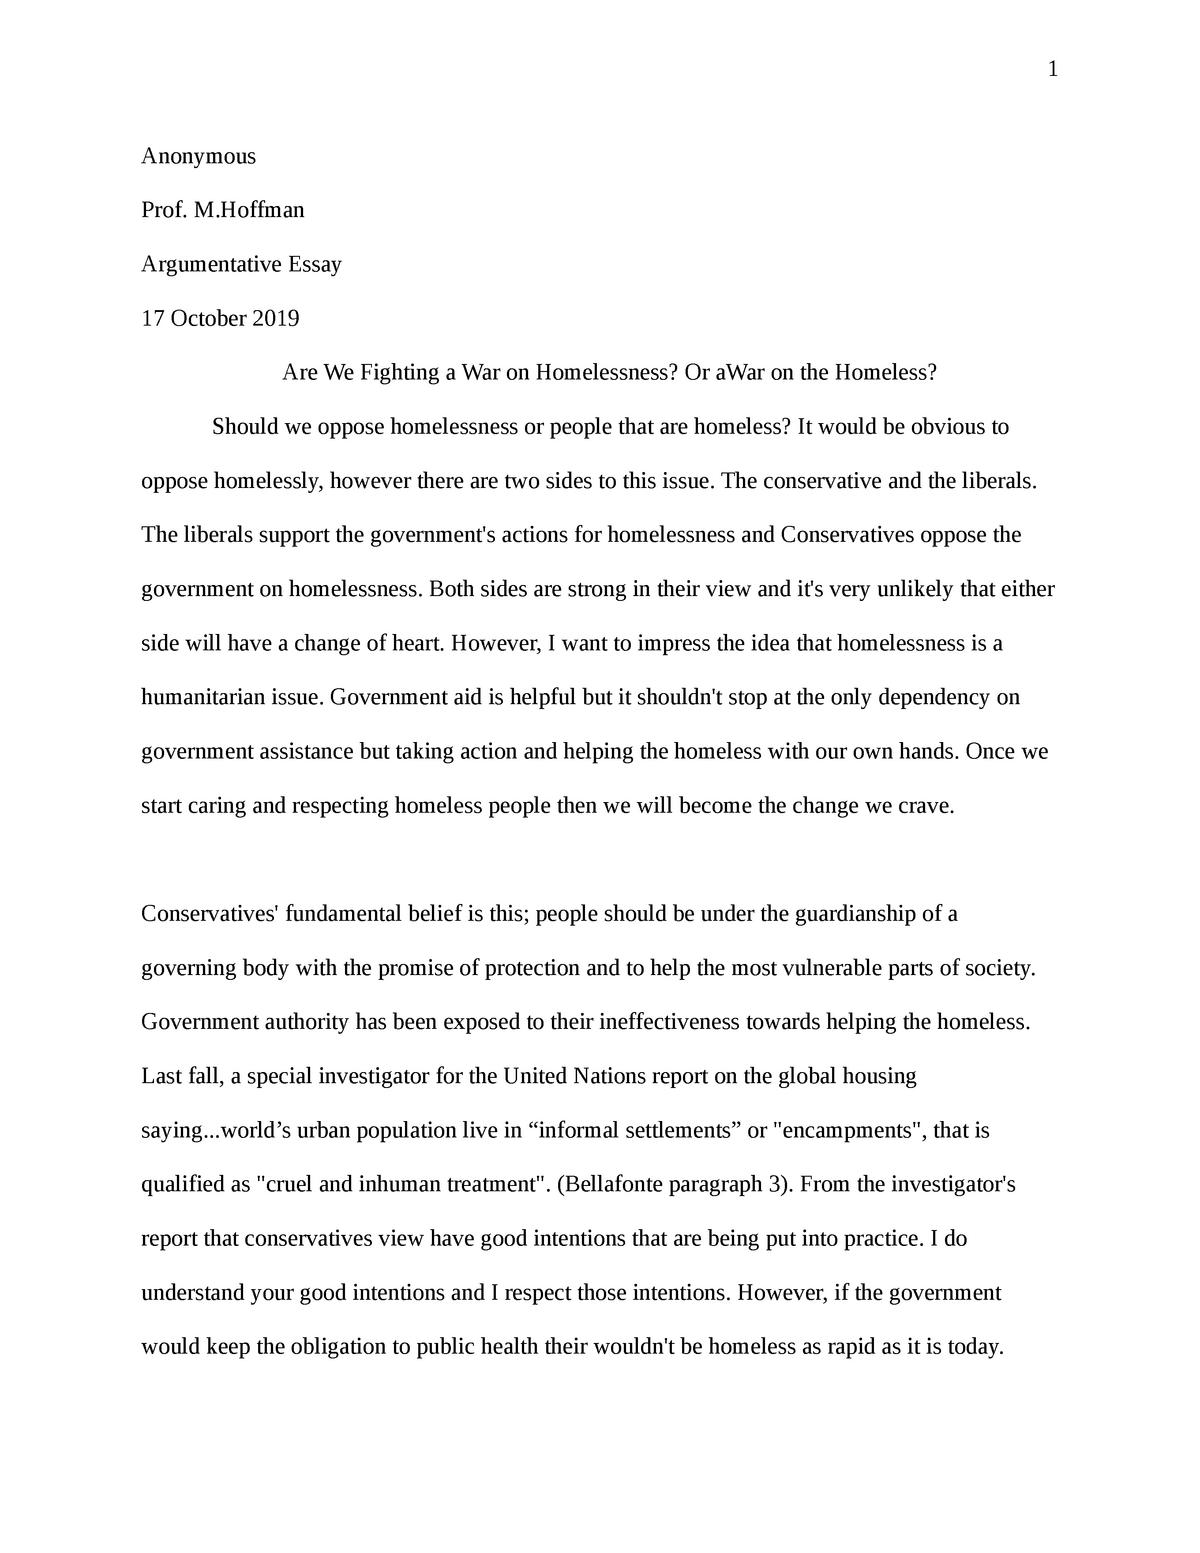 Persuasive essay on the homeless gcse poetry essay